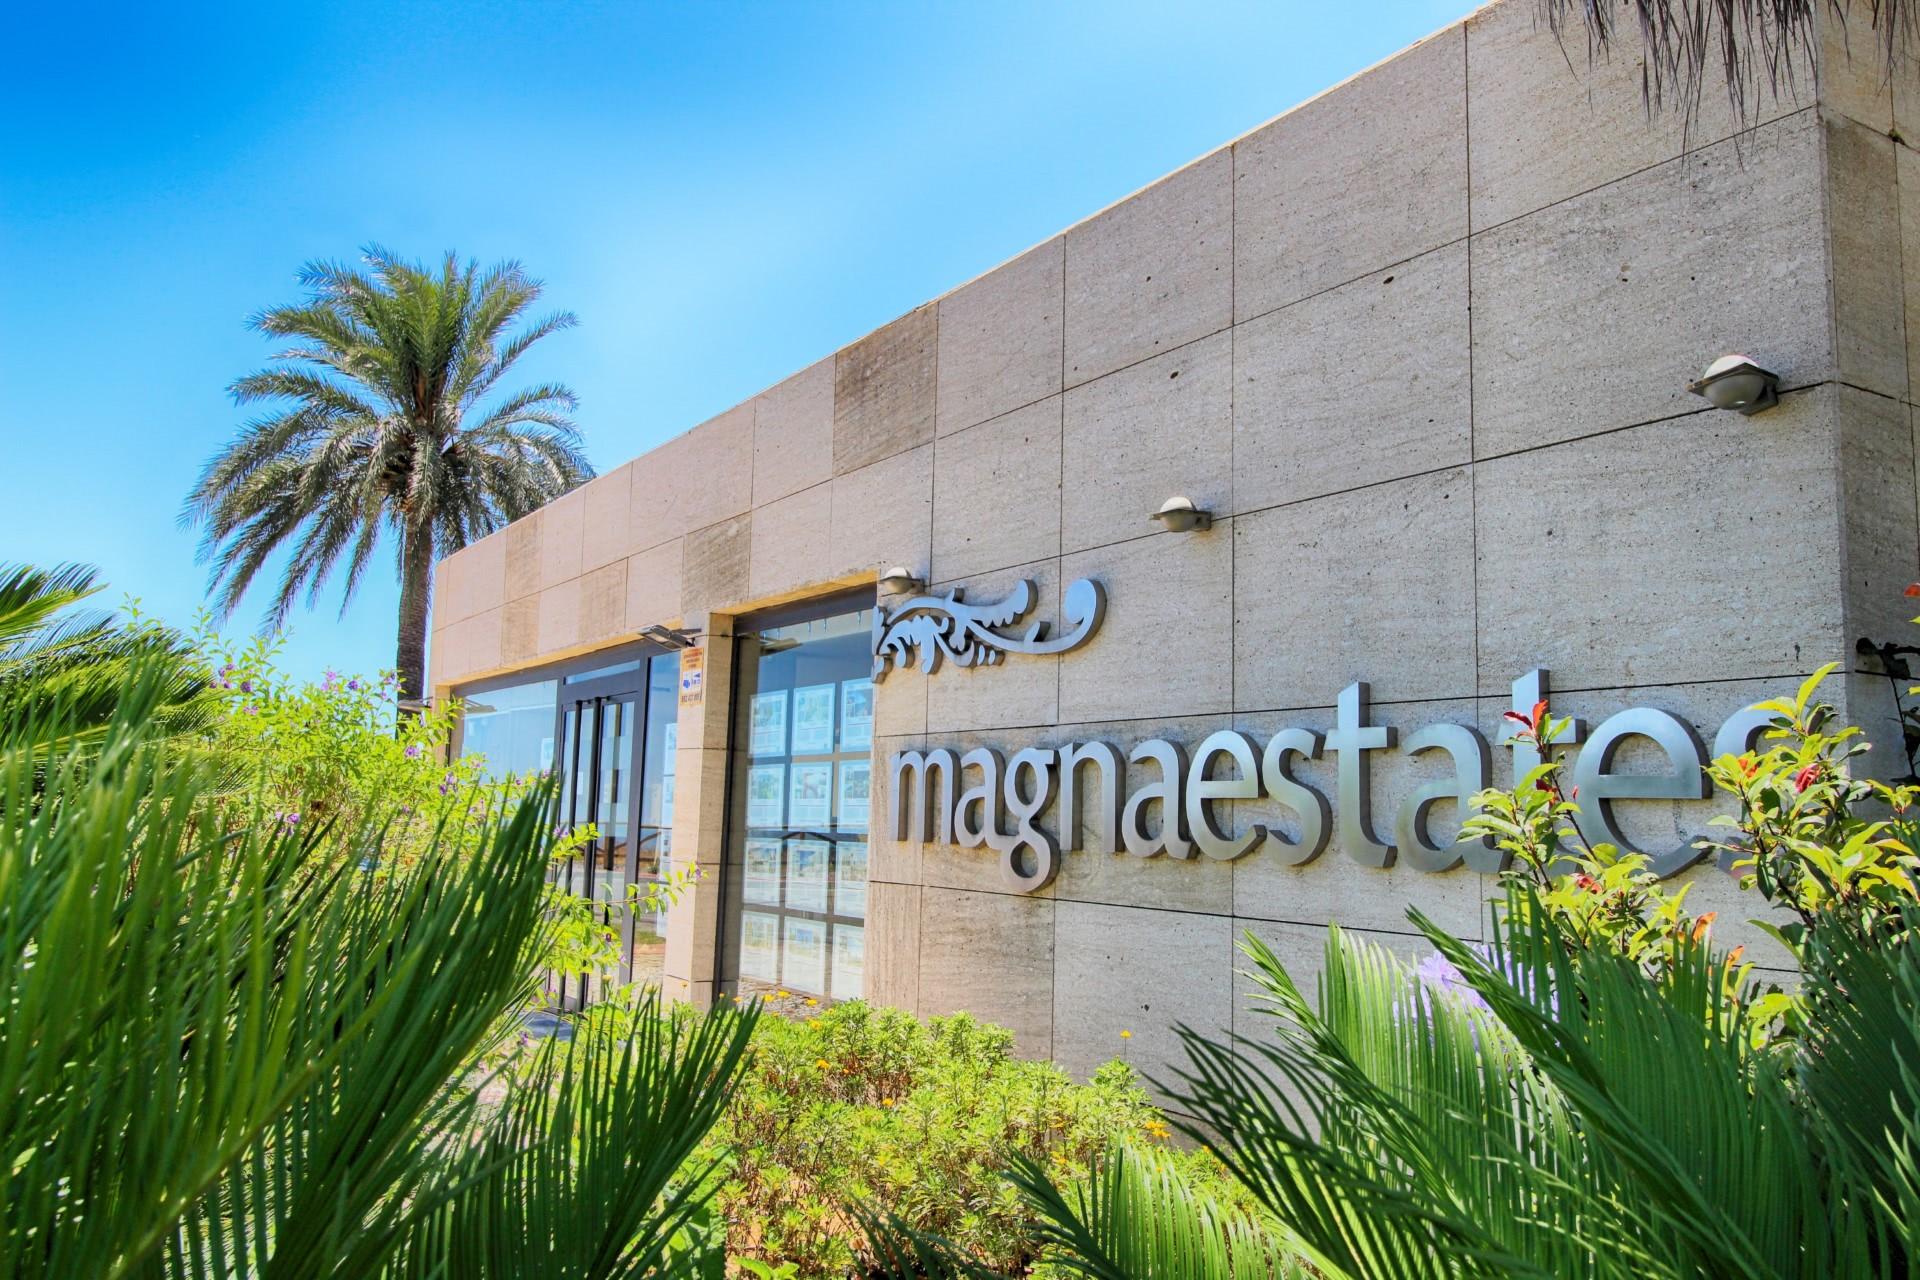 About Magna Estates